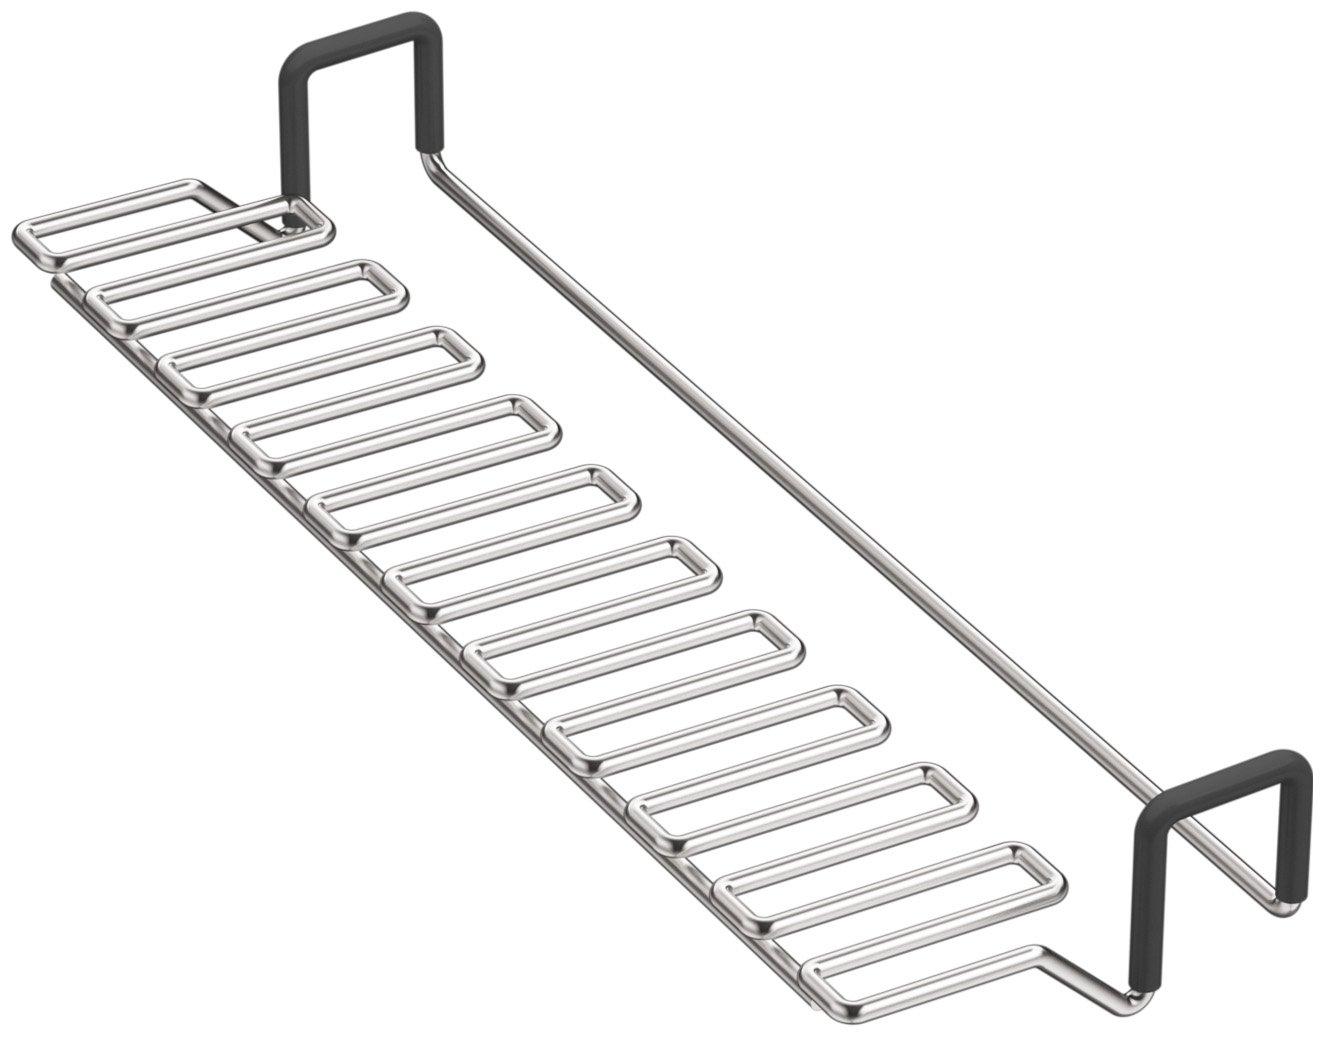 Wunderbar KOHLER K 6434 ST Vault/Strive Saddle Utility Rack, Stainless Steel, 1 Pack    Kitchen Sinks   Amazon.com